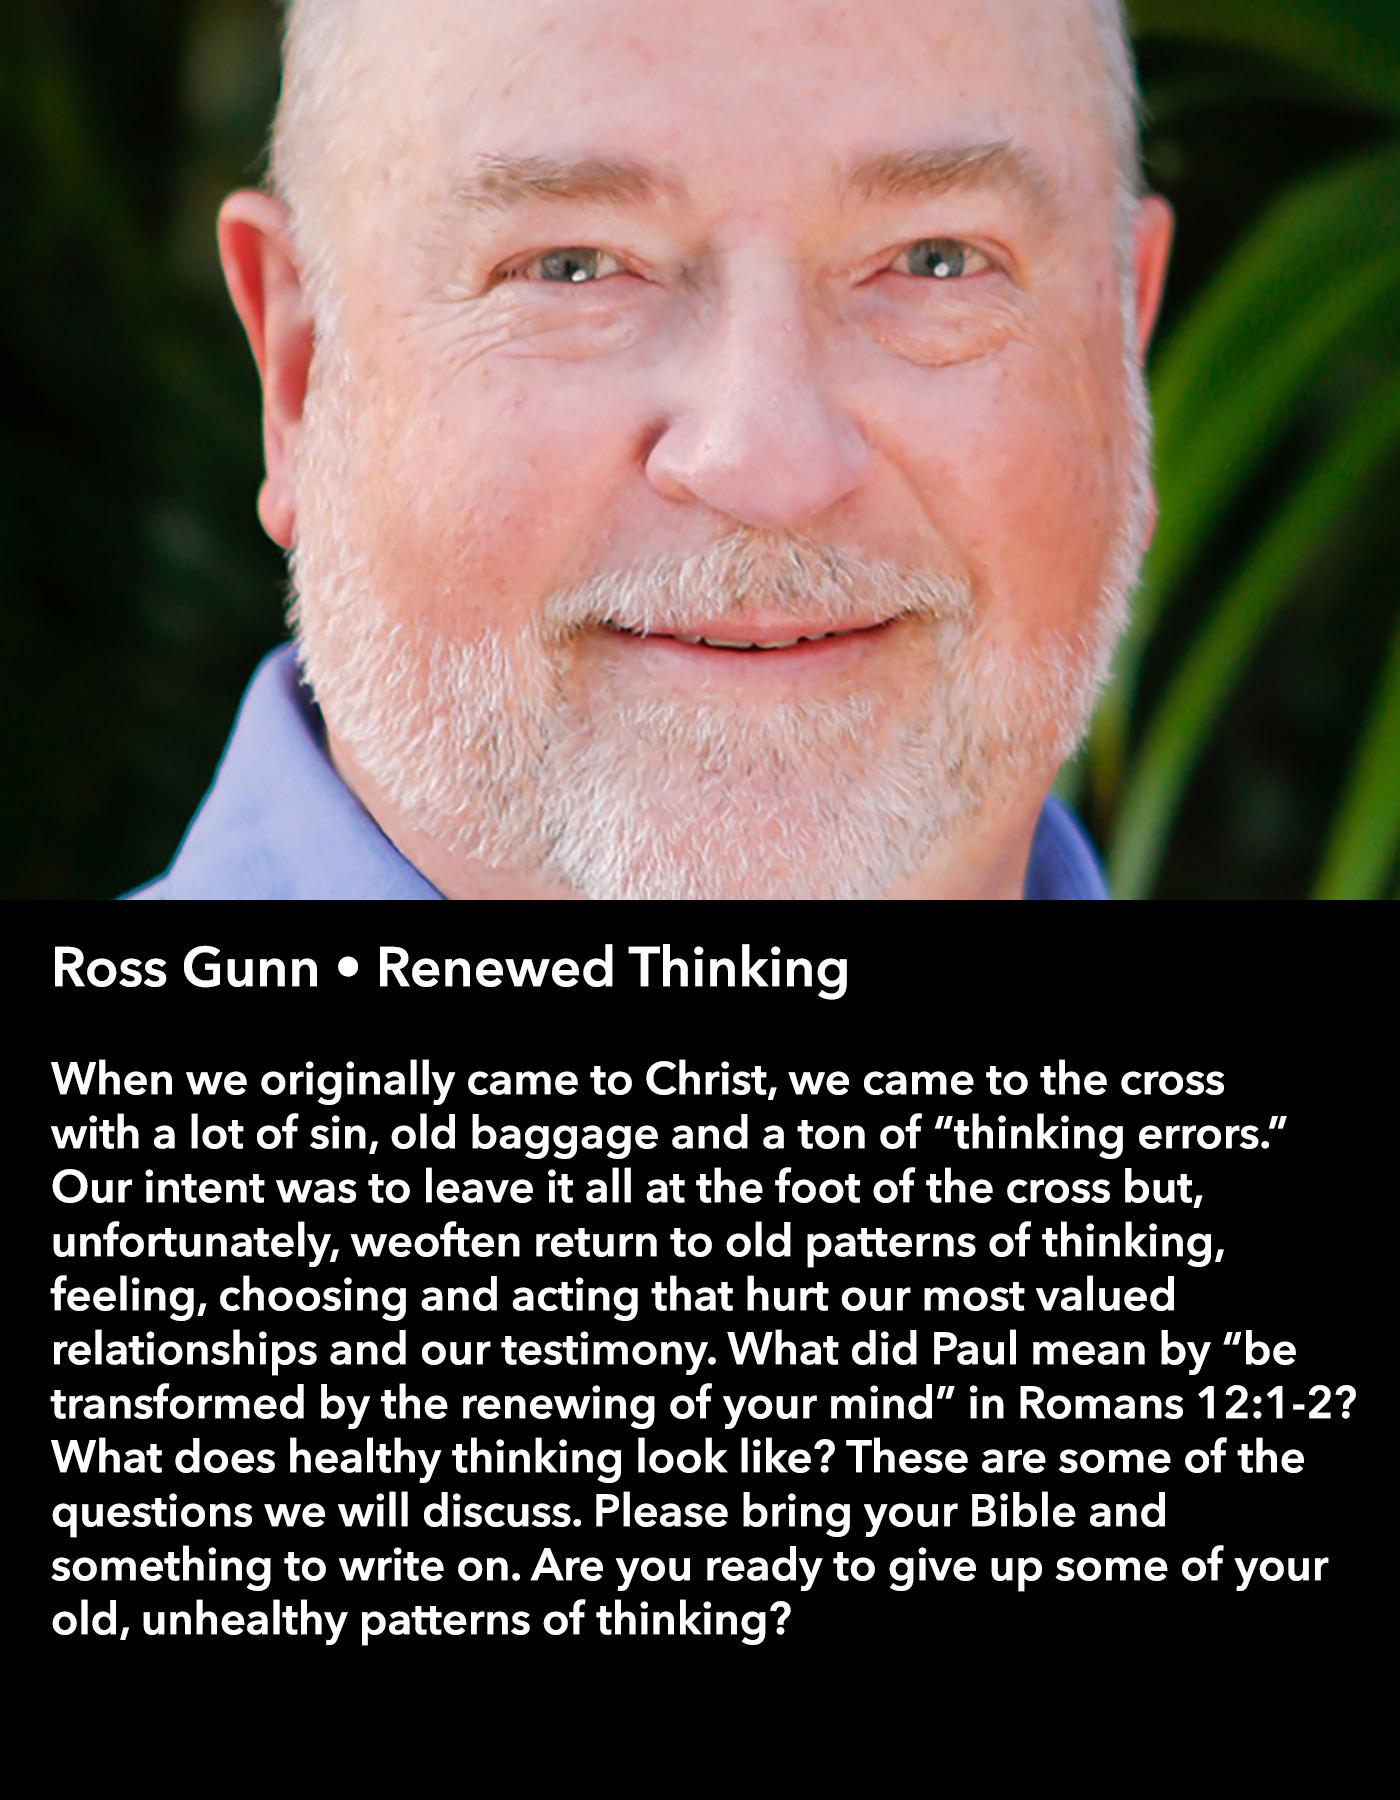 Ross Gunn • Renewed Thinking • Saturday Morning, March 18 • 10:30 – 11:45 am